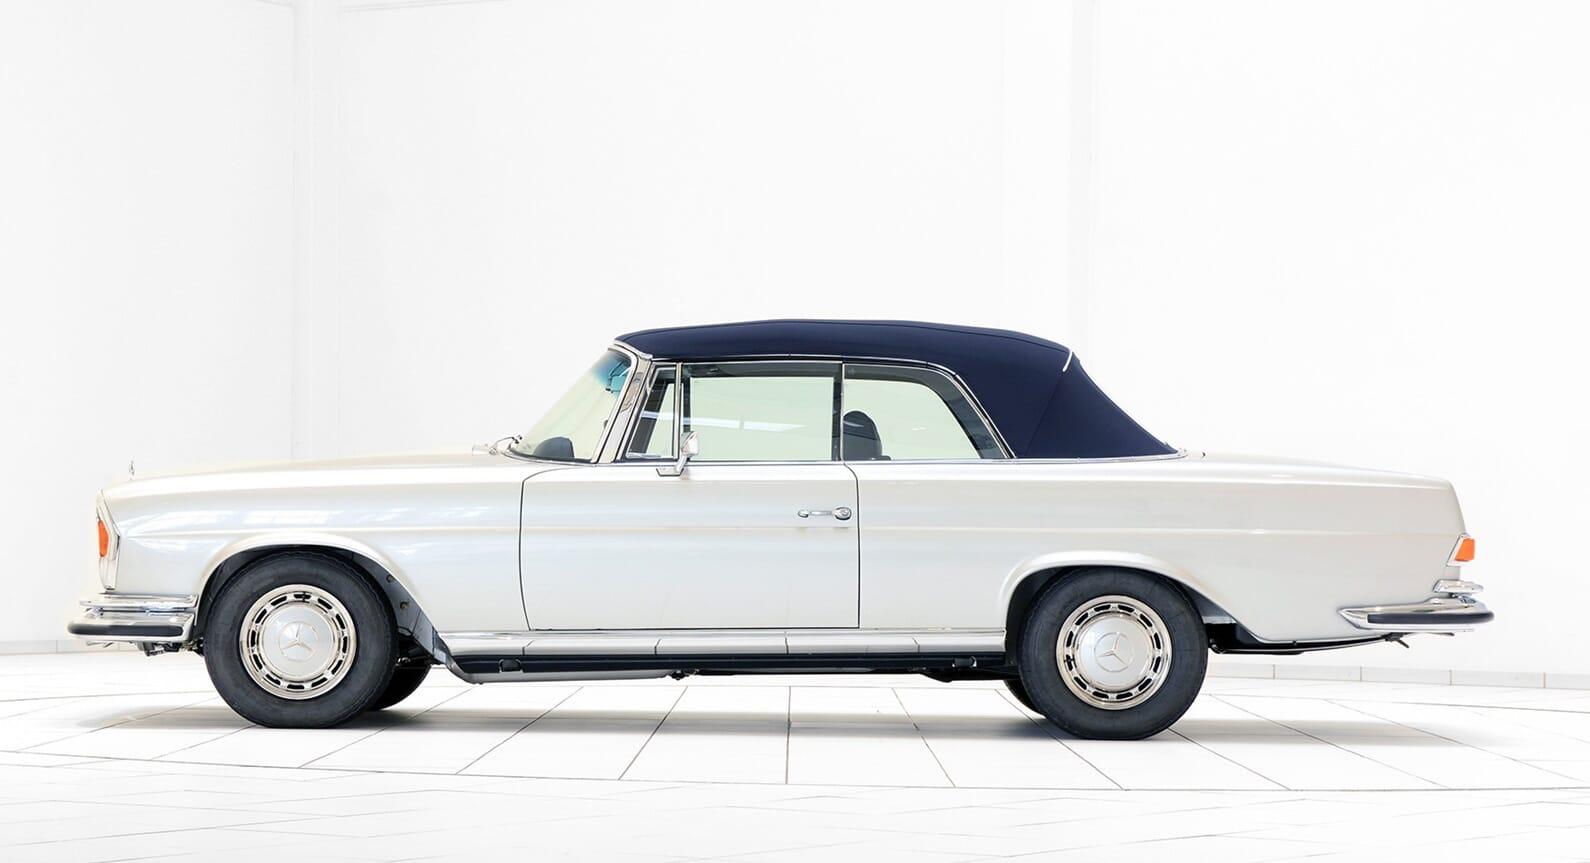 The £500,000 Brabus Mercedes Benz 280 SE